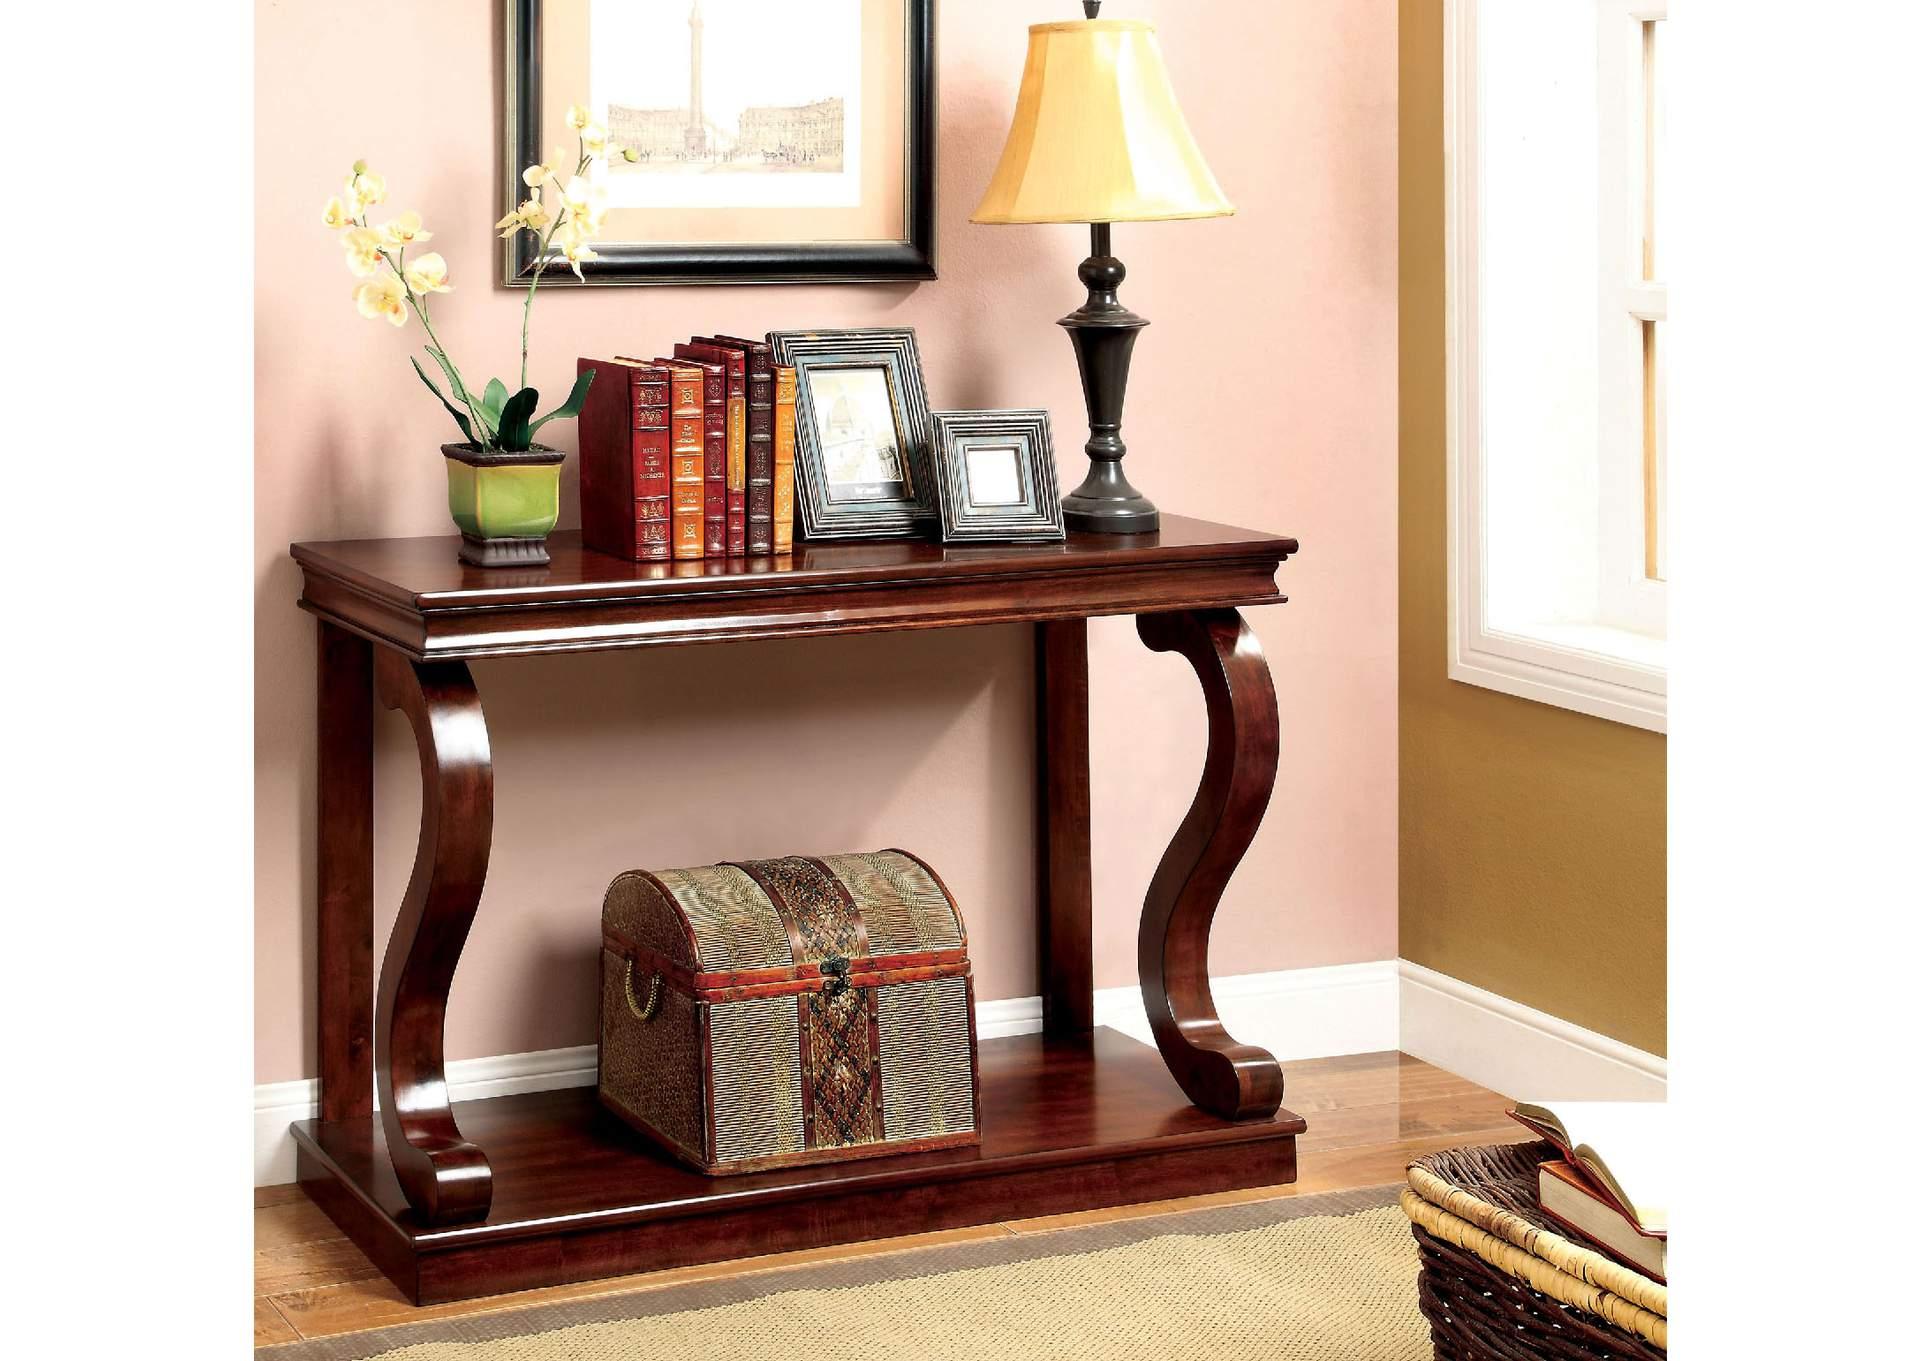 Geelong Cherry Console Table W/S Shaped Legs U0026 Open Shelf,Furniture Of